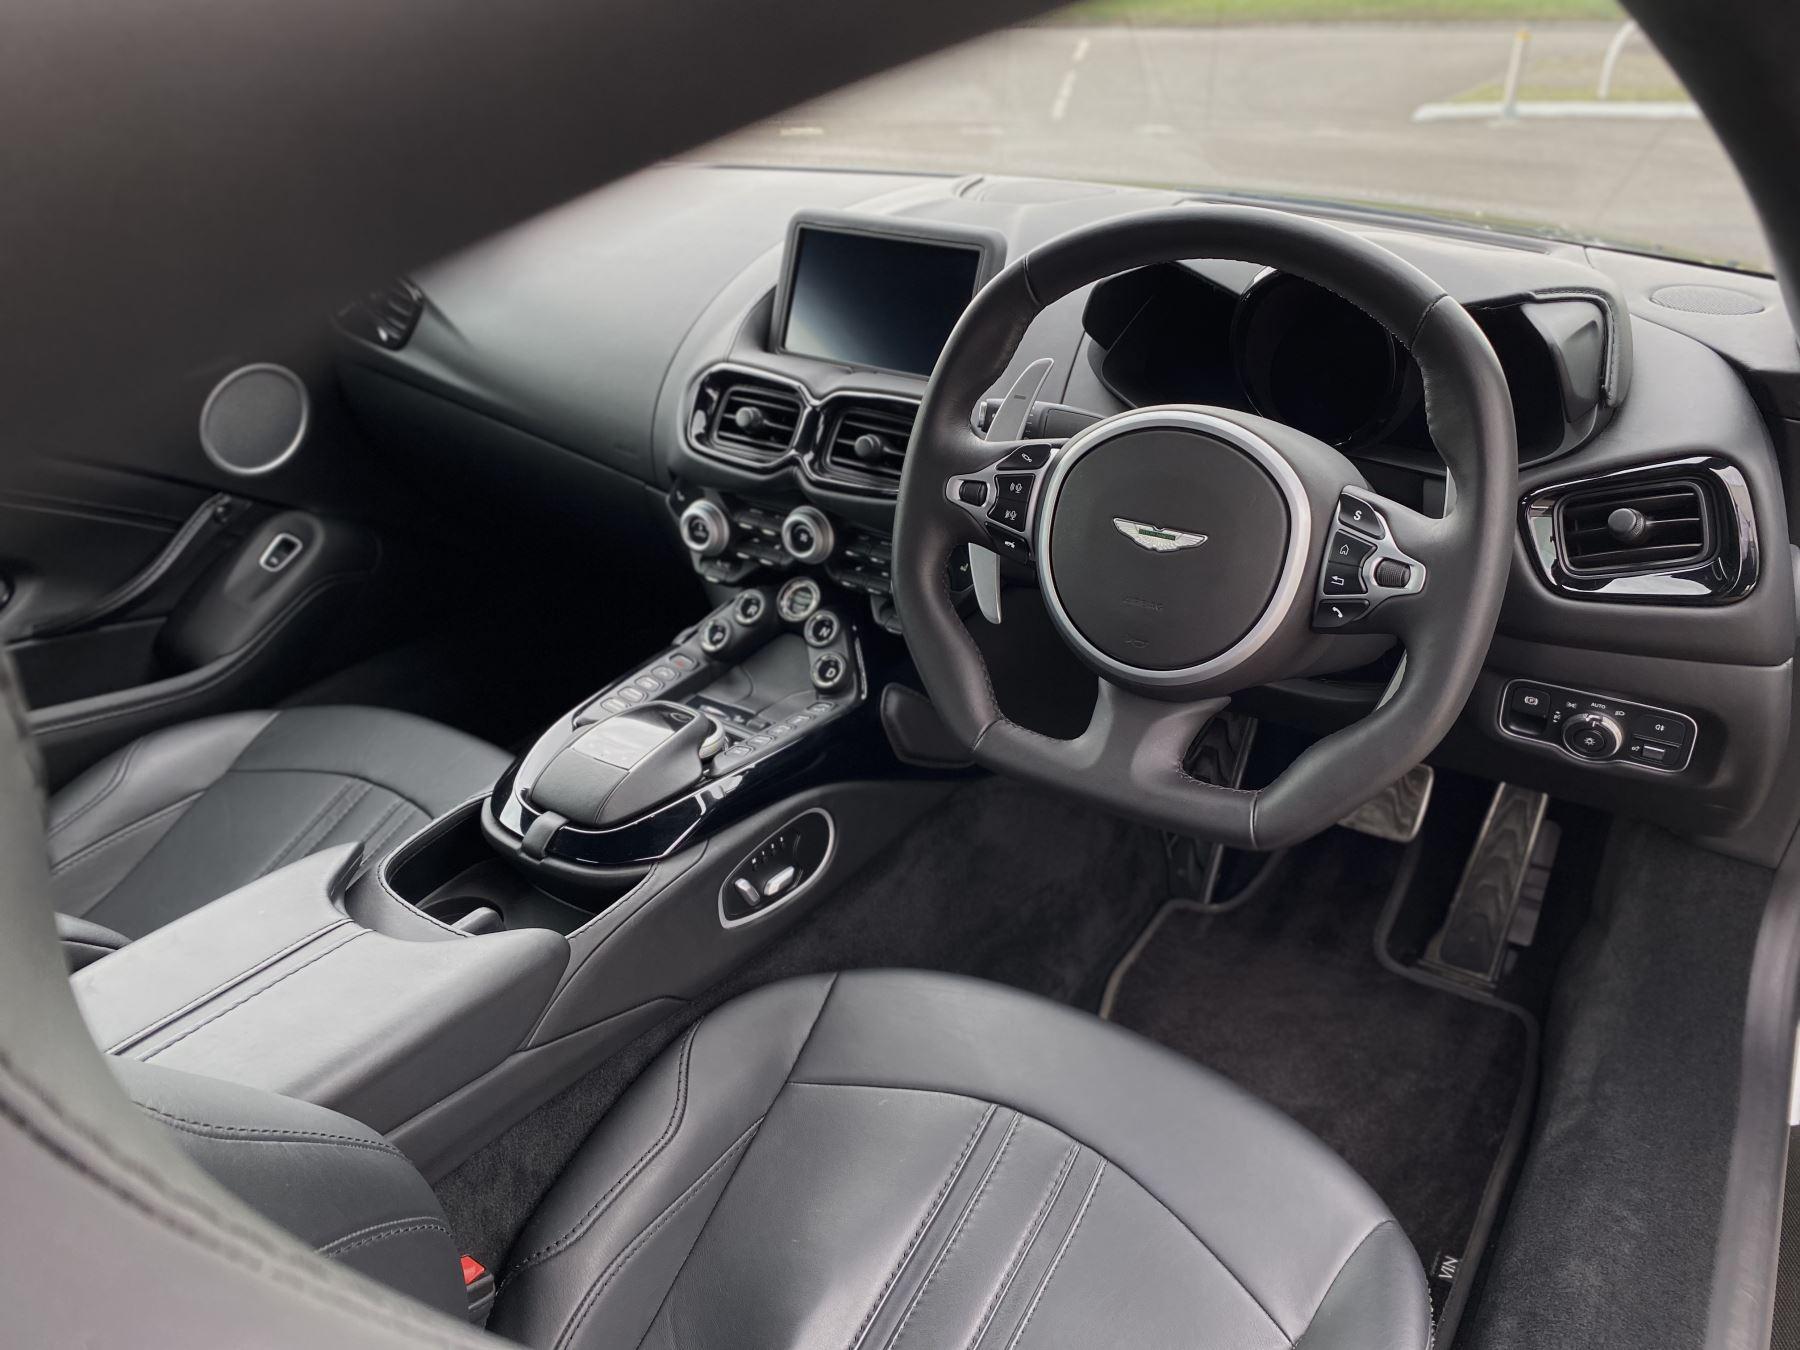 Aston Martin New Vantage 2dr ZF 8 Speed Auto. 4.0 Twin Turbo ZF Gearbox  Reversing Camera Heated Seats Ceramic Brakes image 22